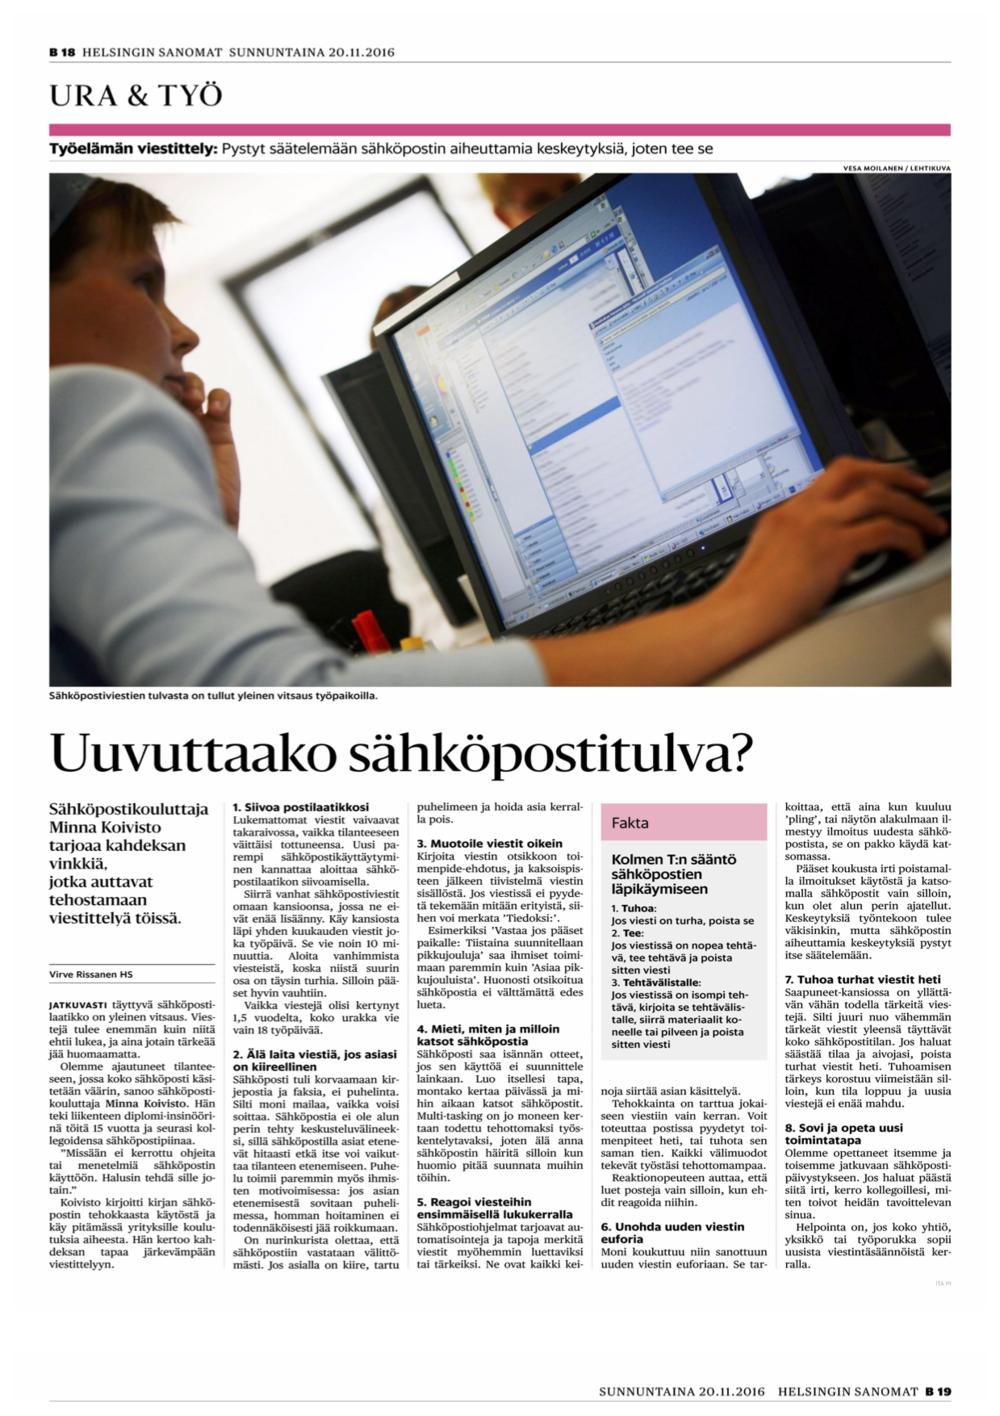 20161120 Helsingin Sanomat, Ura & Työ -osio.png